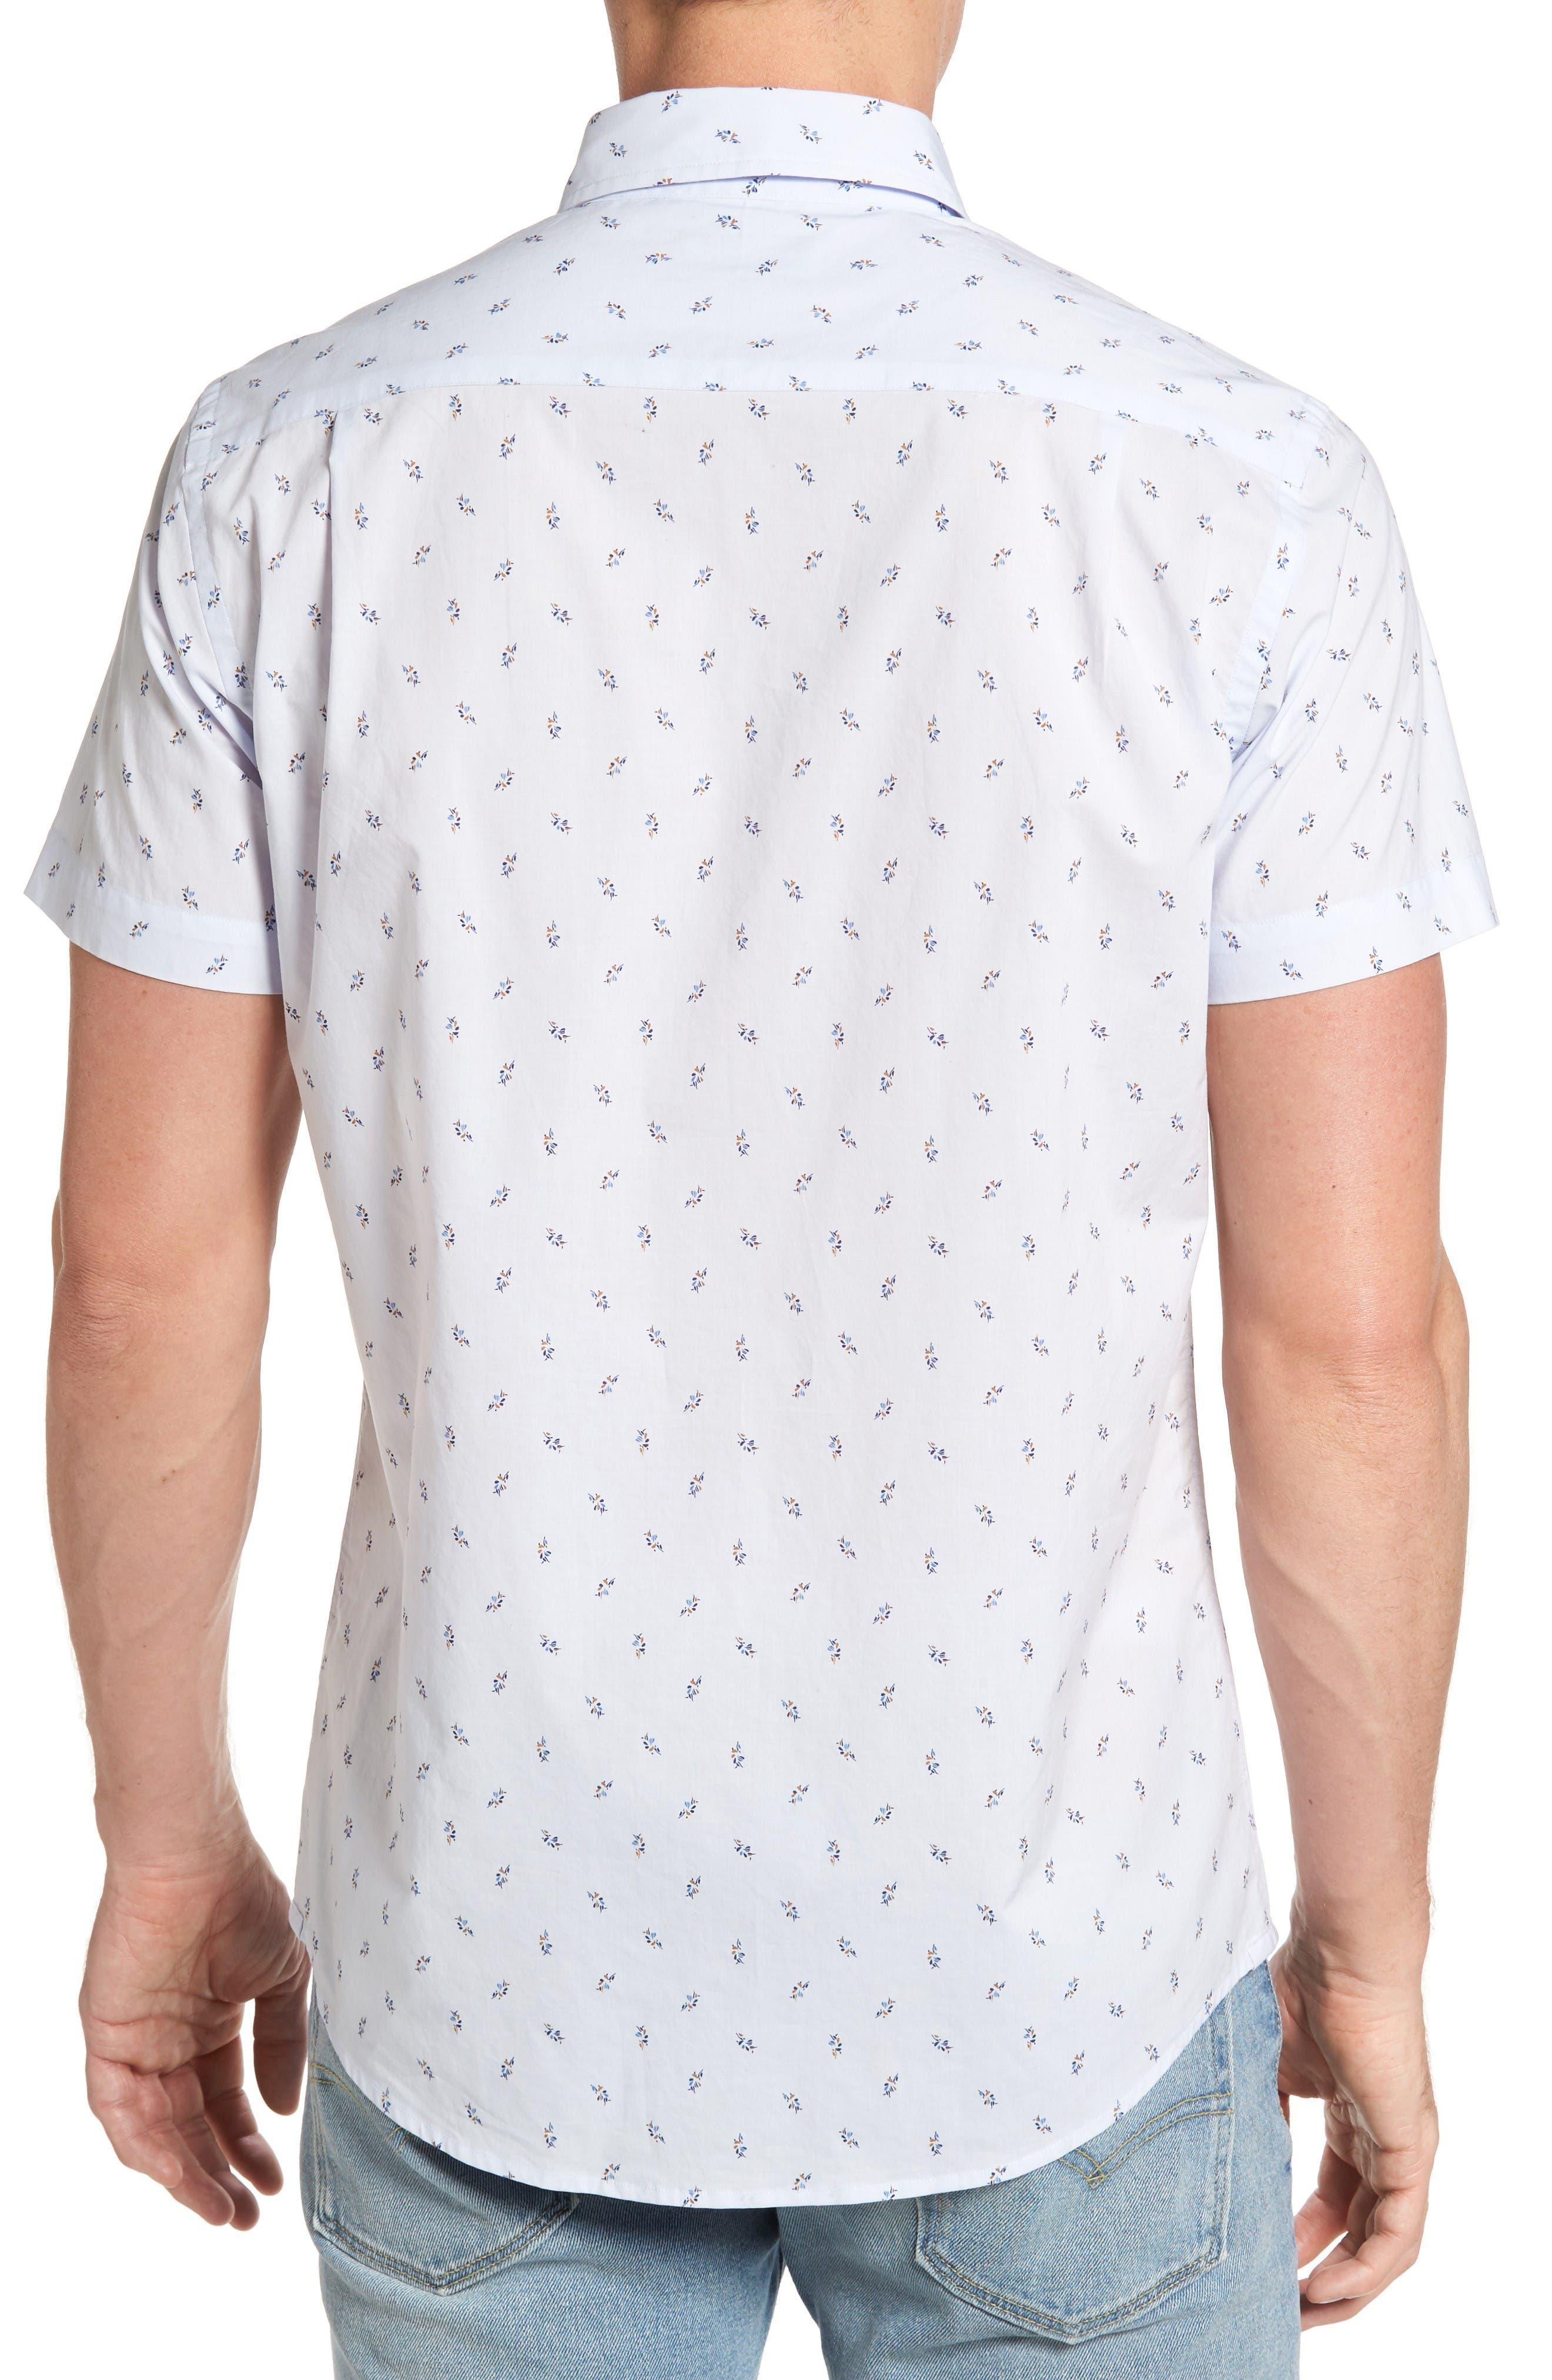 Waterfront Sport Shirt,                             Alternate thumbnail 3, color,                             Powder Blue